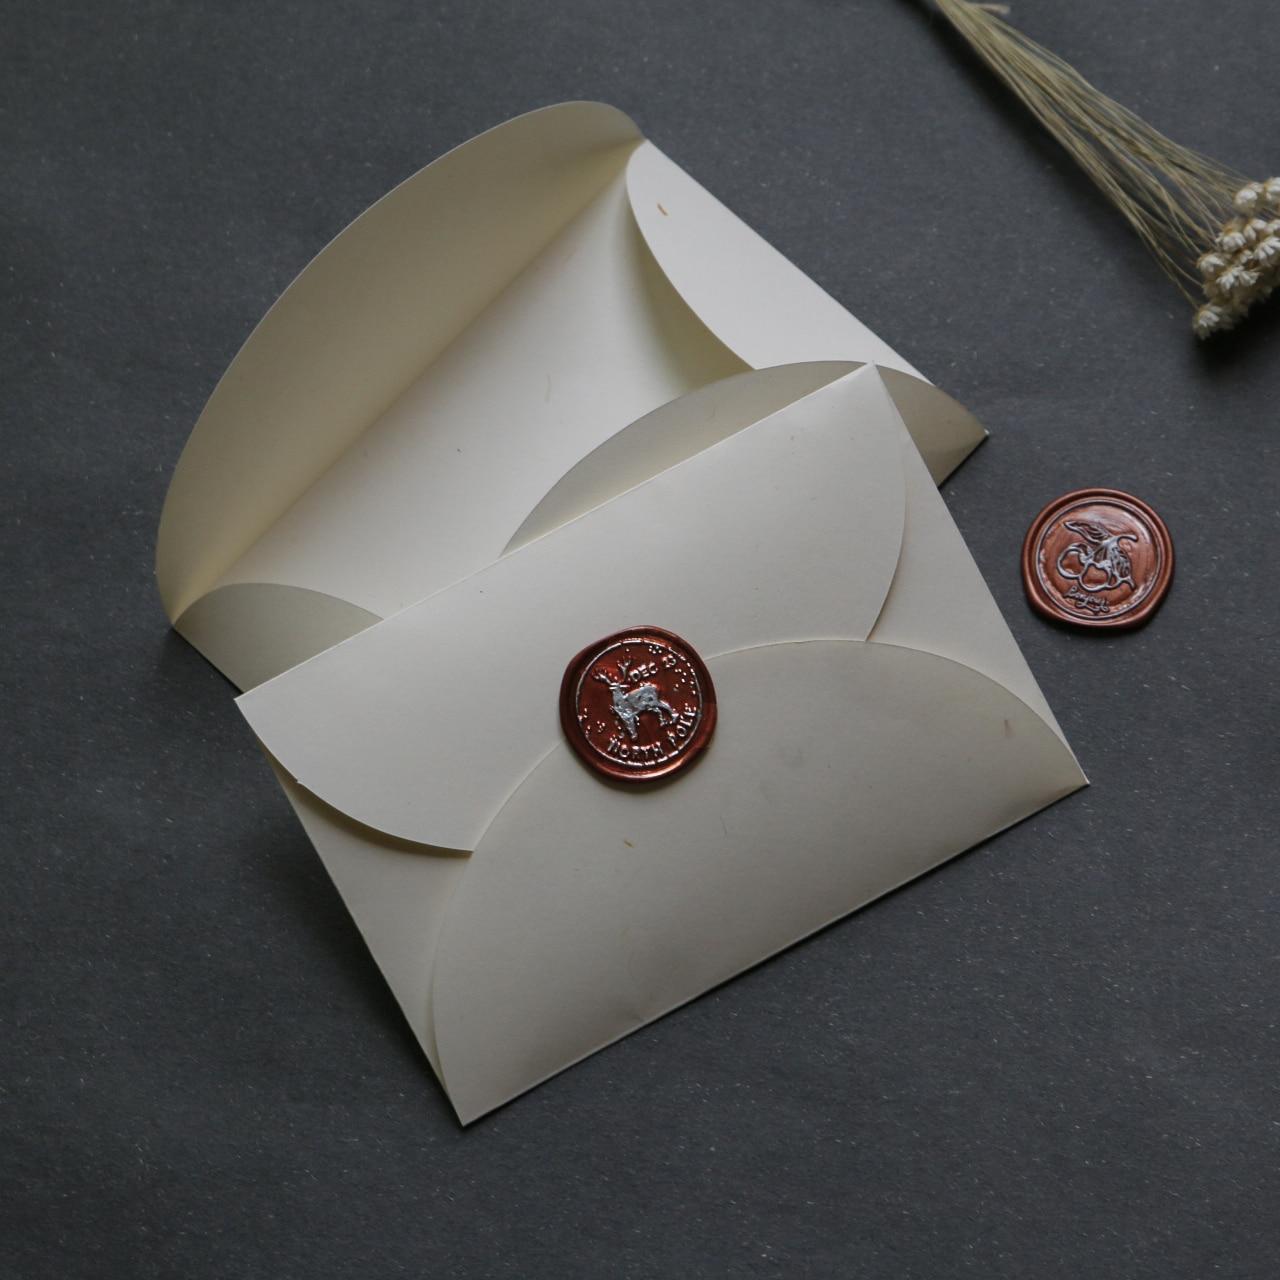 20pcs/set Vintage Ivory White Window Envelope Wedding Invitation Envelope Gift Postcard Cover Sobres Papel Stationery Zakka Gift